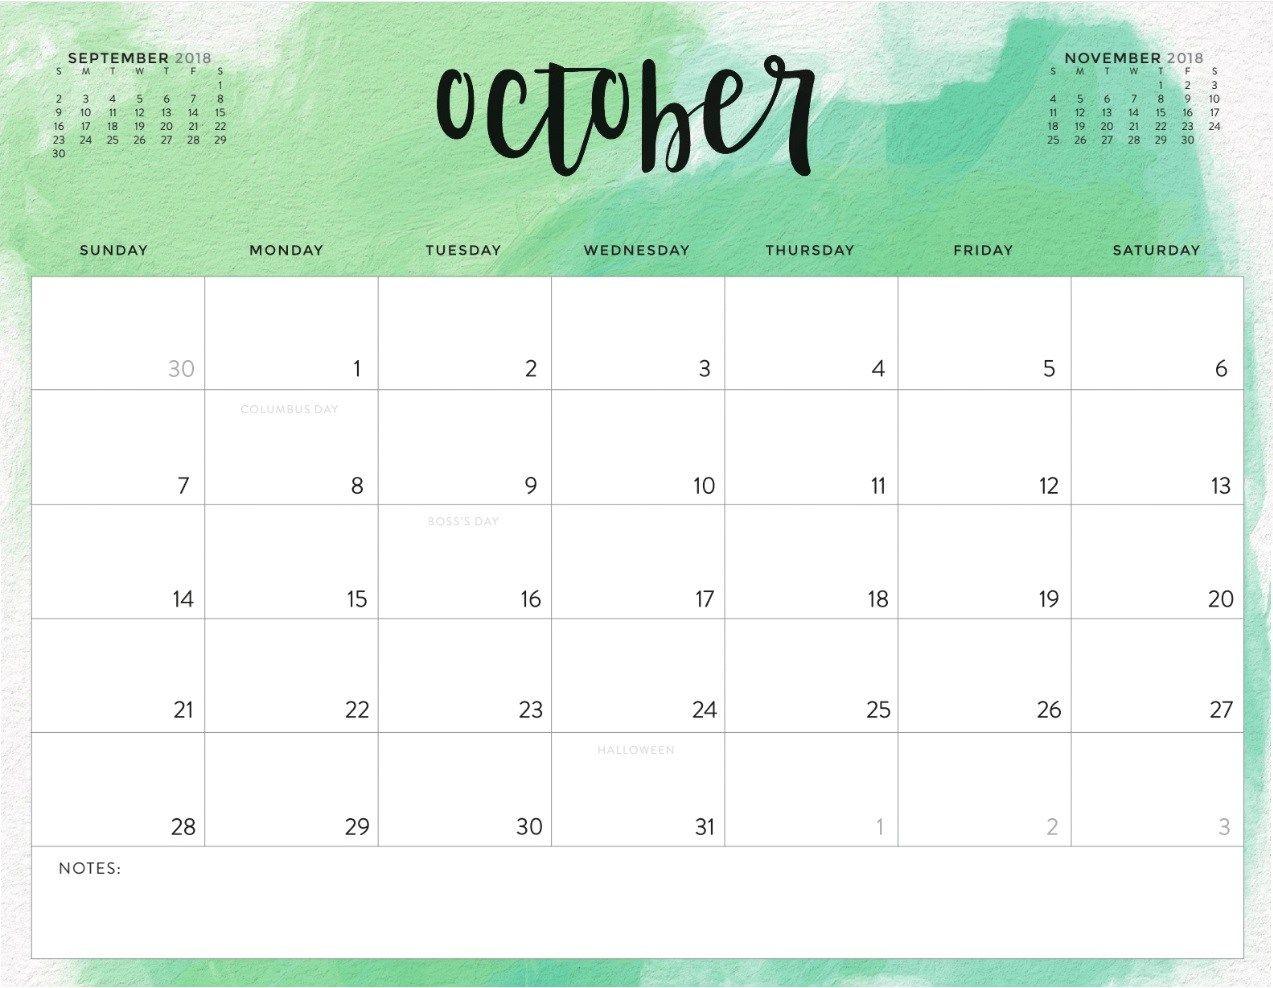 October Calendar 2018 Printable : Cute october printable calendar october calendar